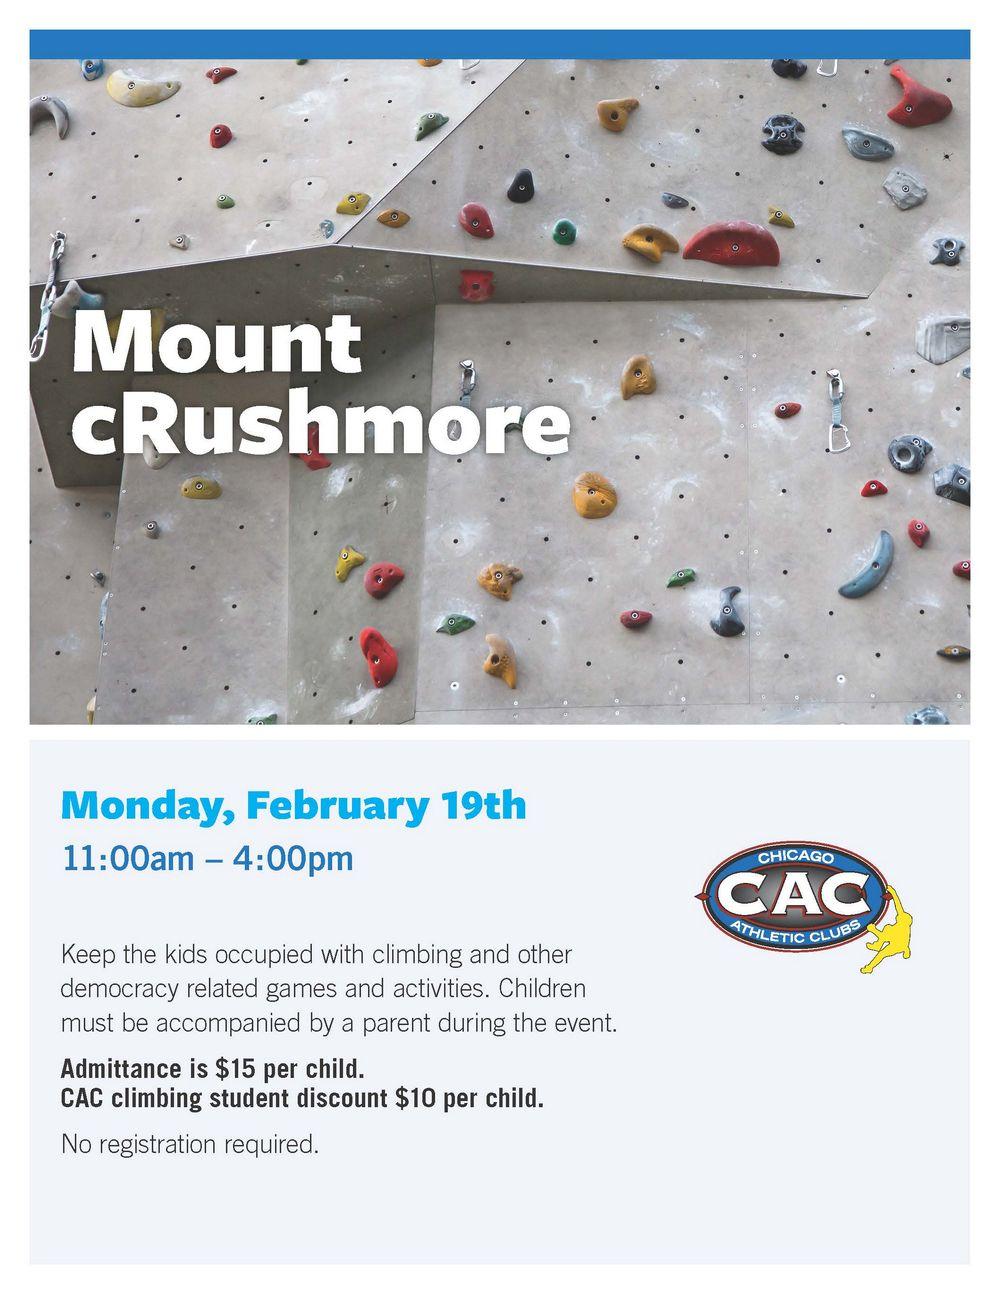 CAC_MountcRushmore.jpg